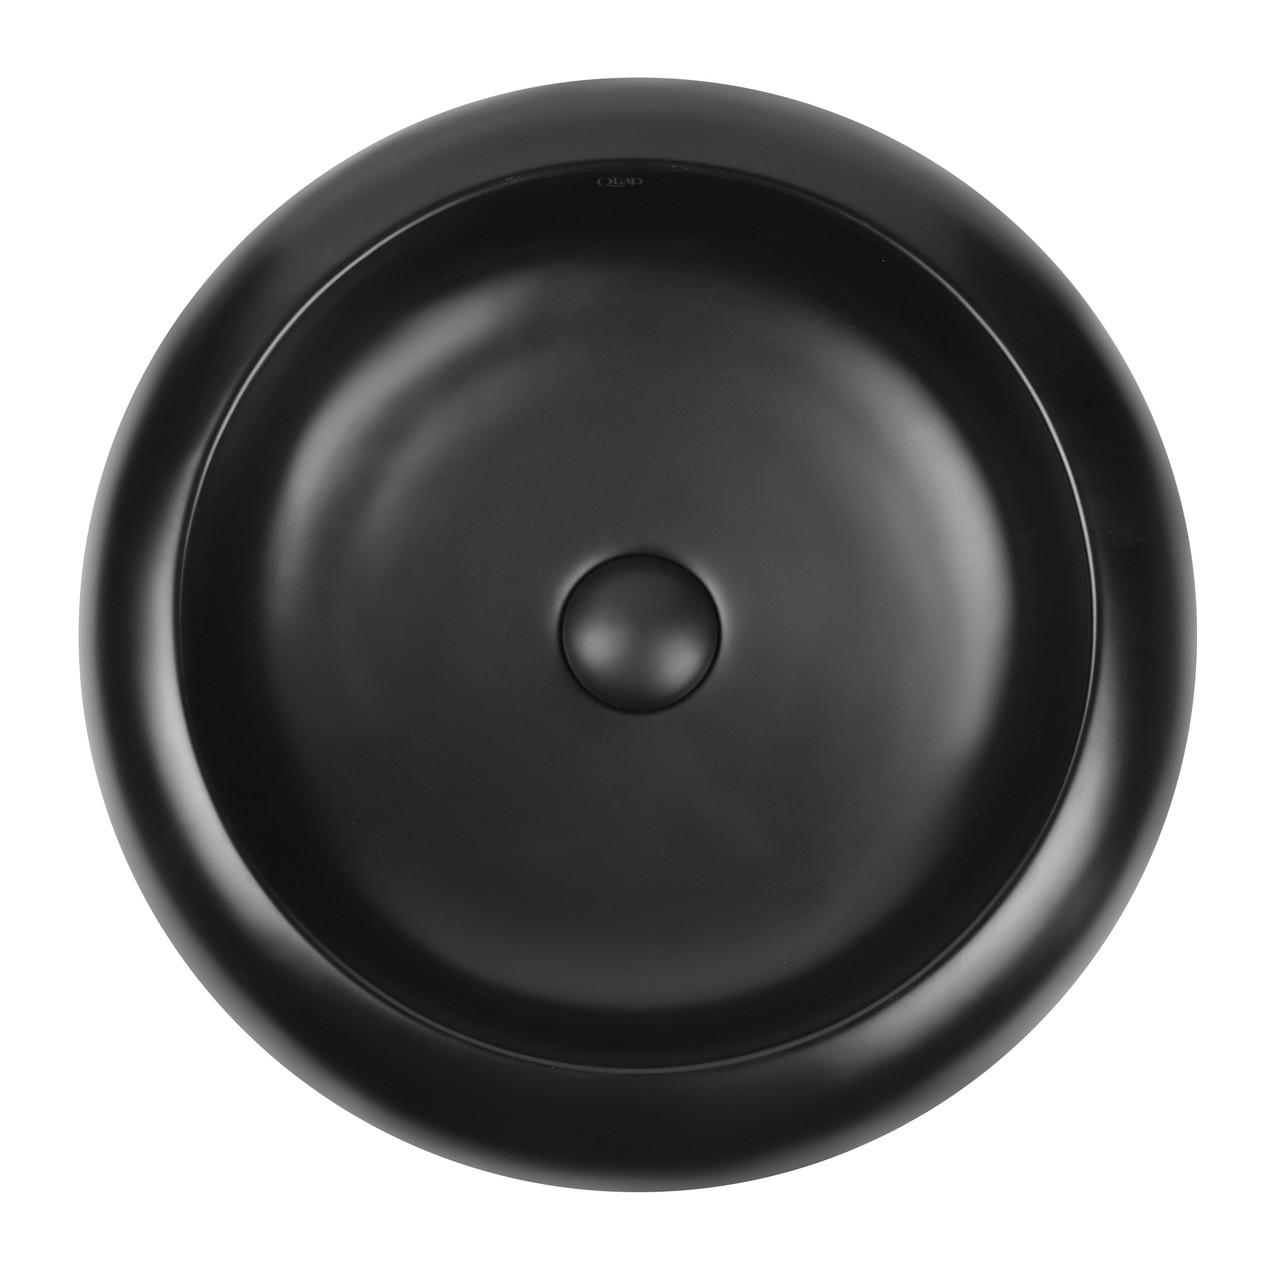 Раковина-чаша Qtap Robin з донним клапаном QT13113062MB